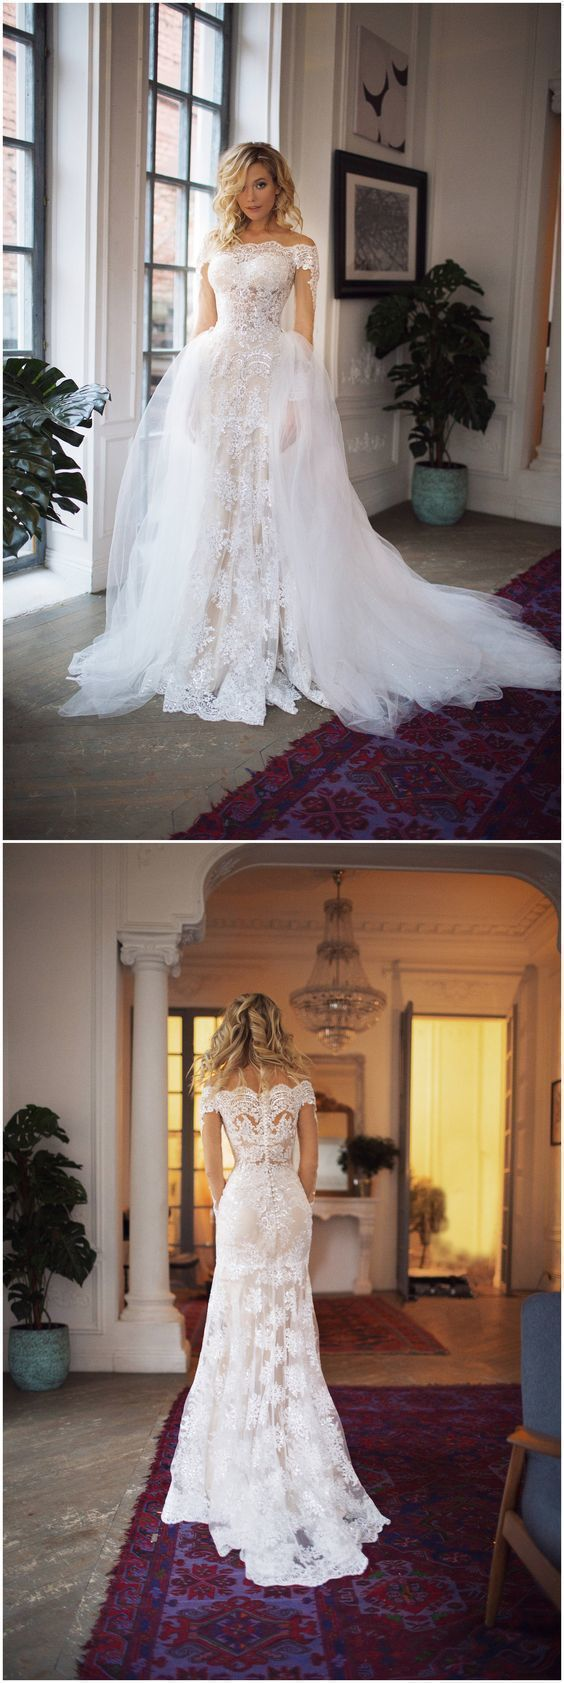 Charming Glamorous Custom Made Mermaid Wedding Dress lace wedding gowns sexy wedding dresses